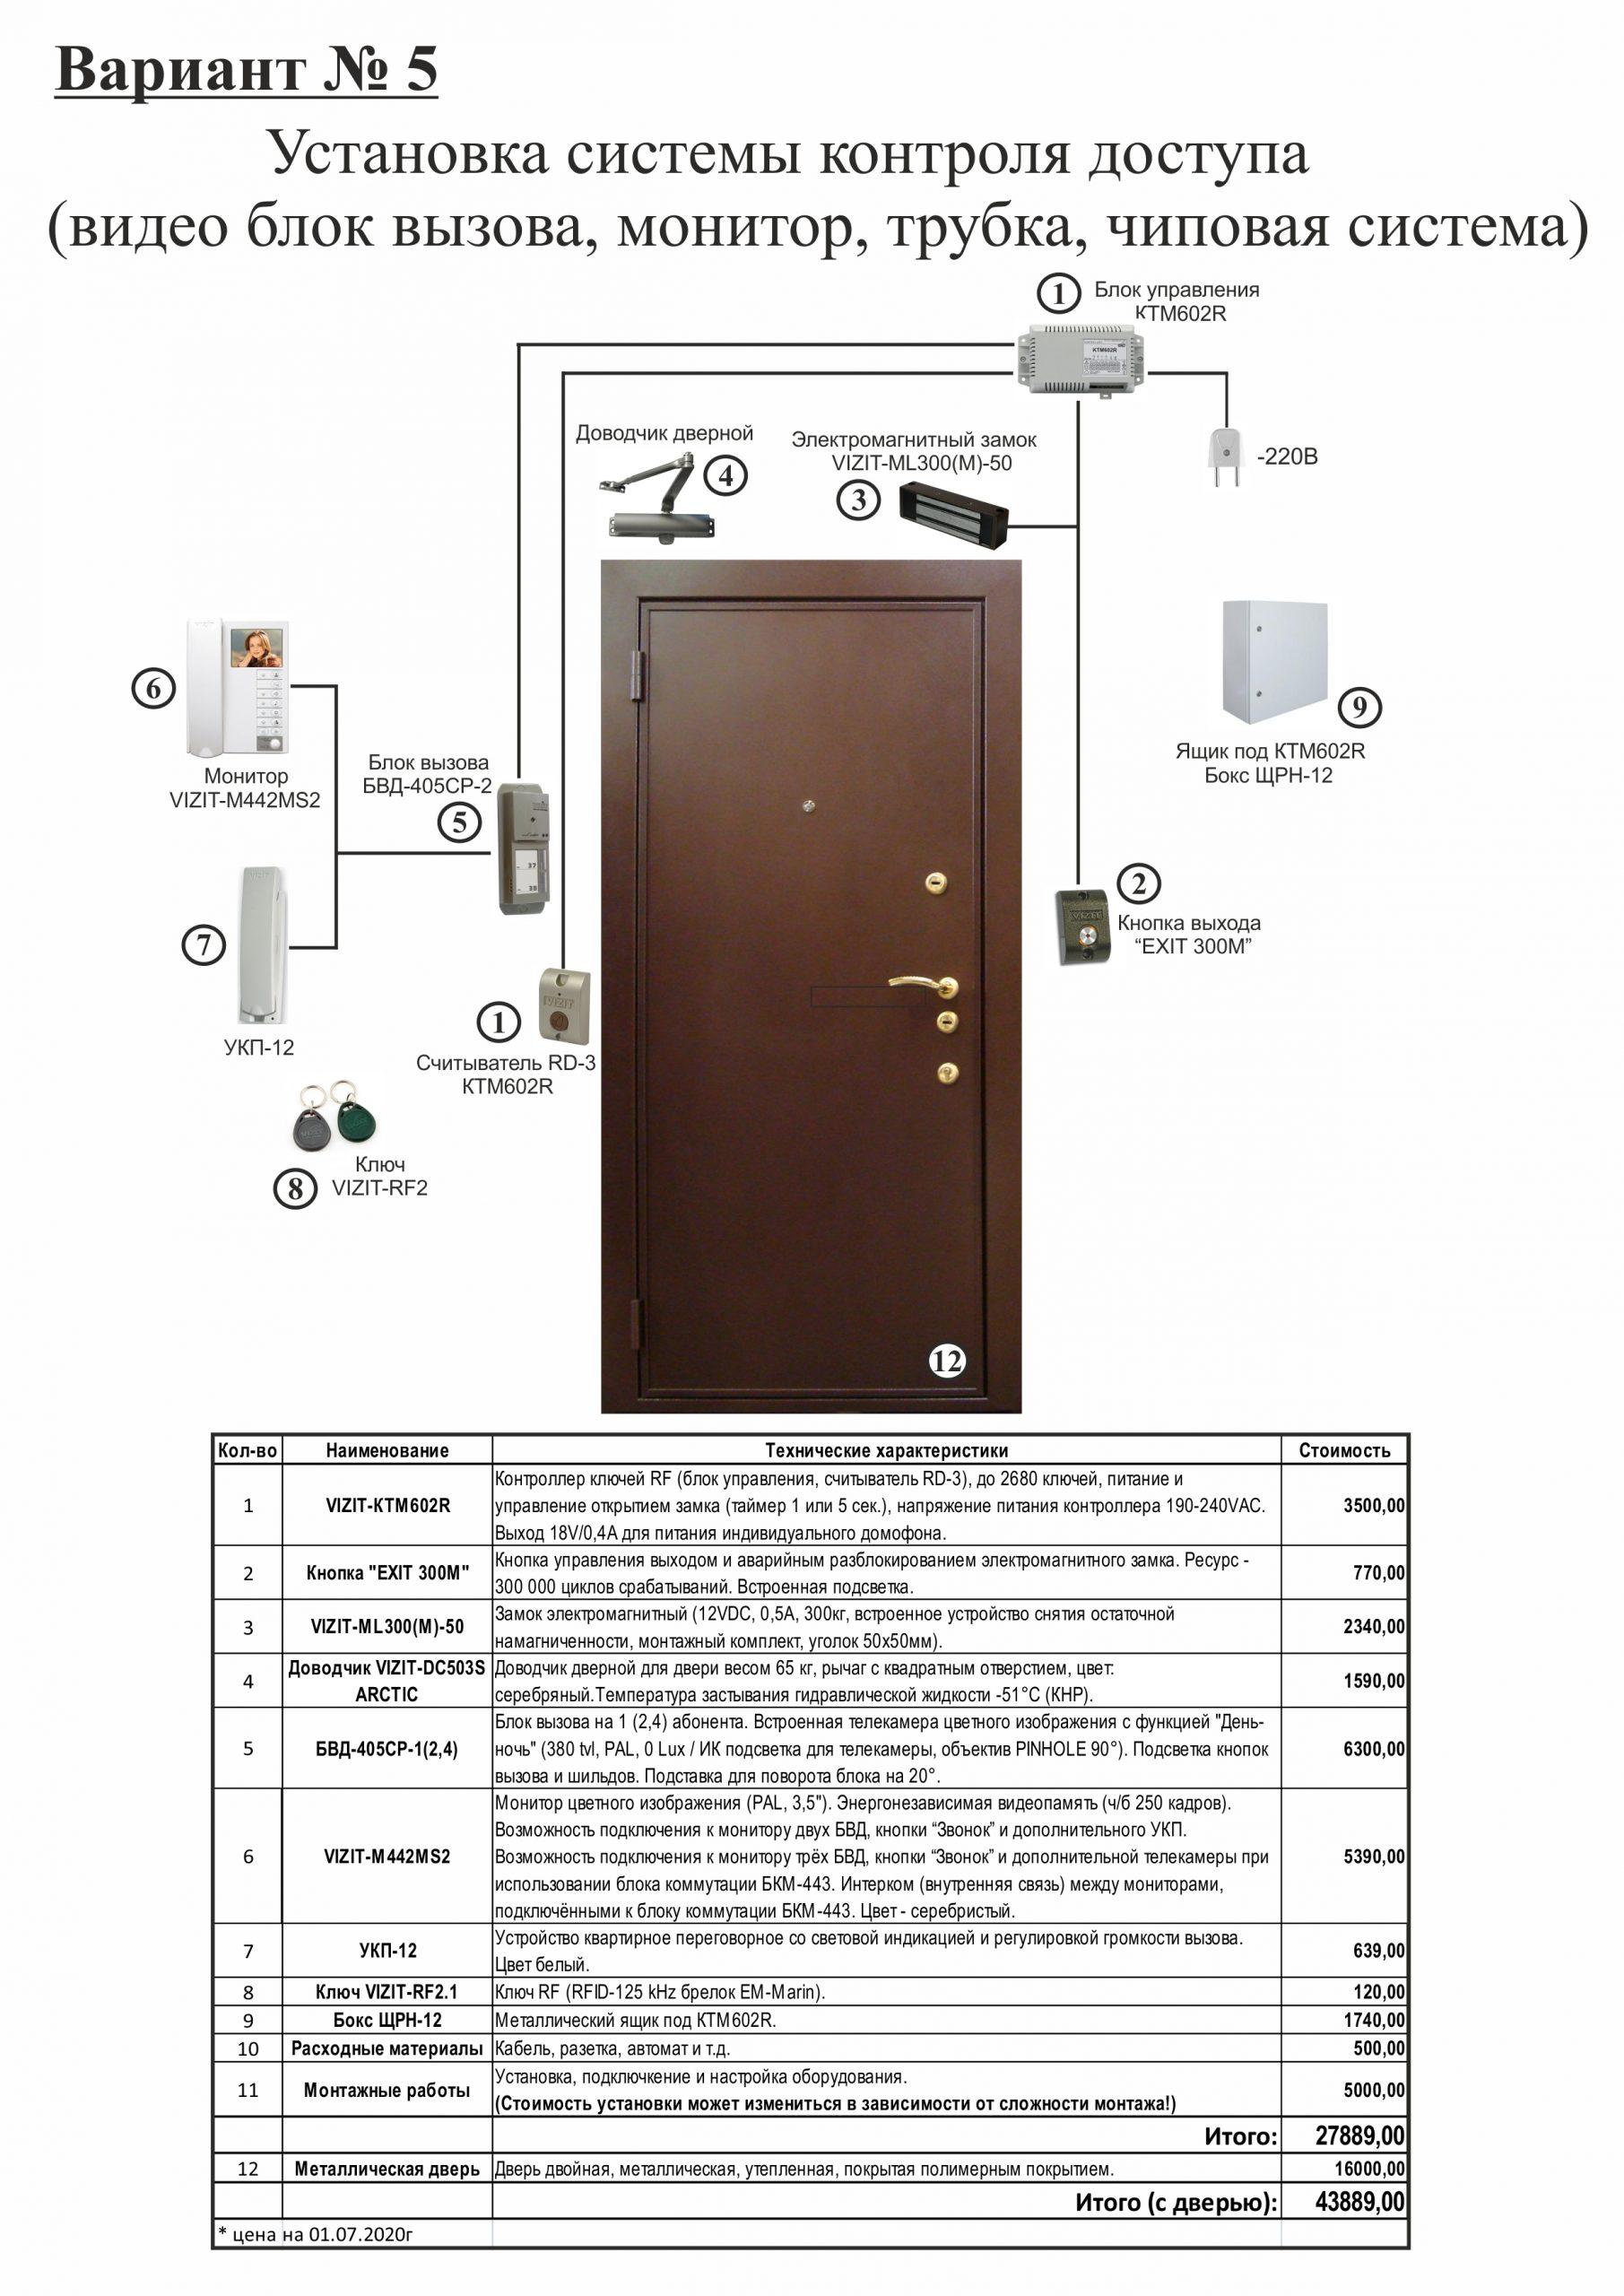 Установка КТМ602R, БВД-405CP-2, Монитора VIZIT-М441MG и УКП-12